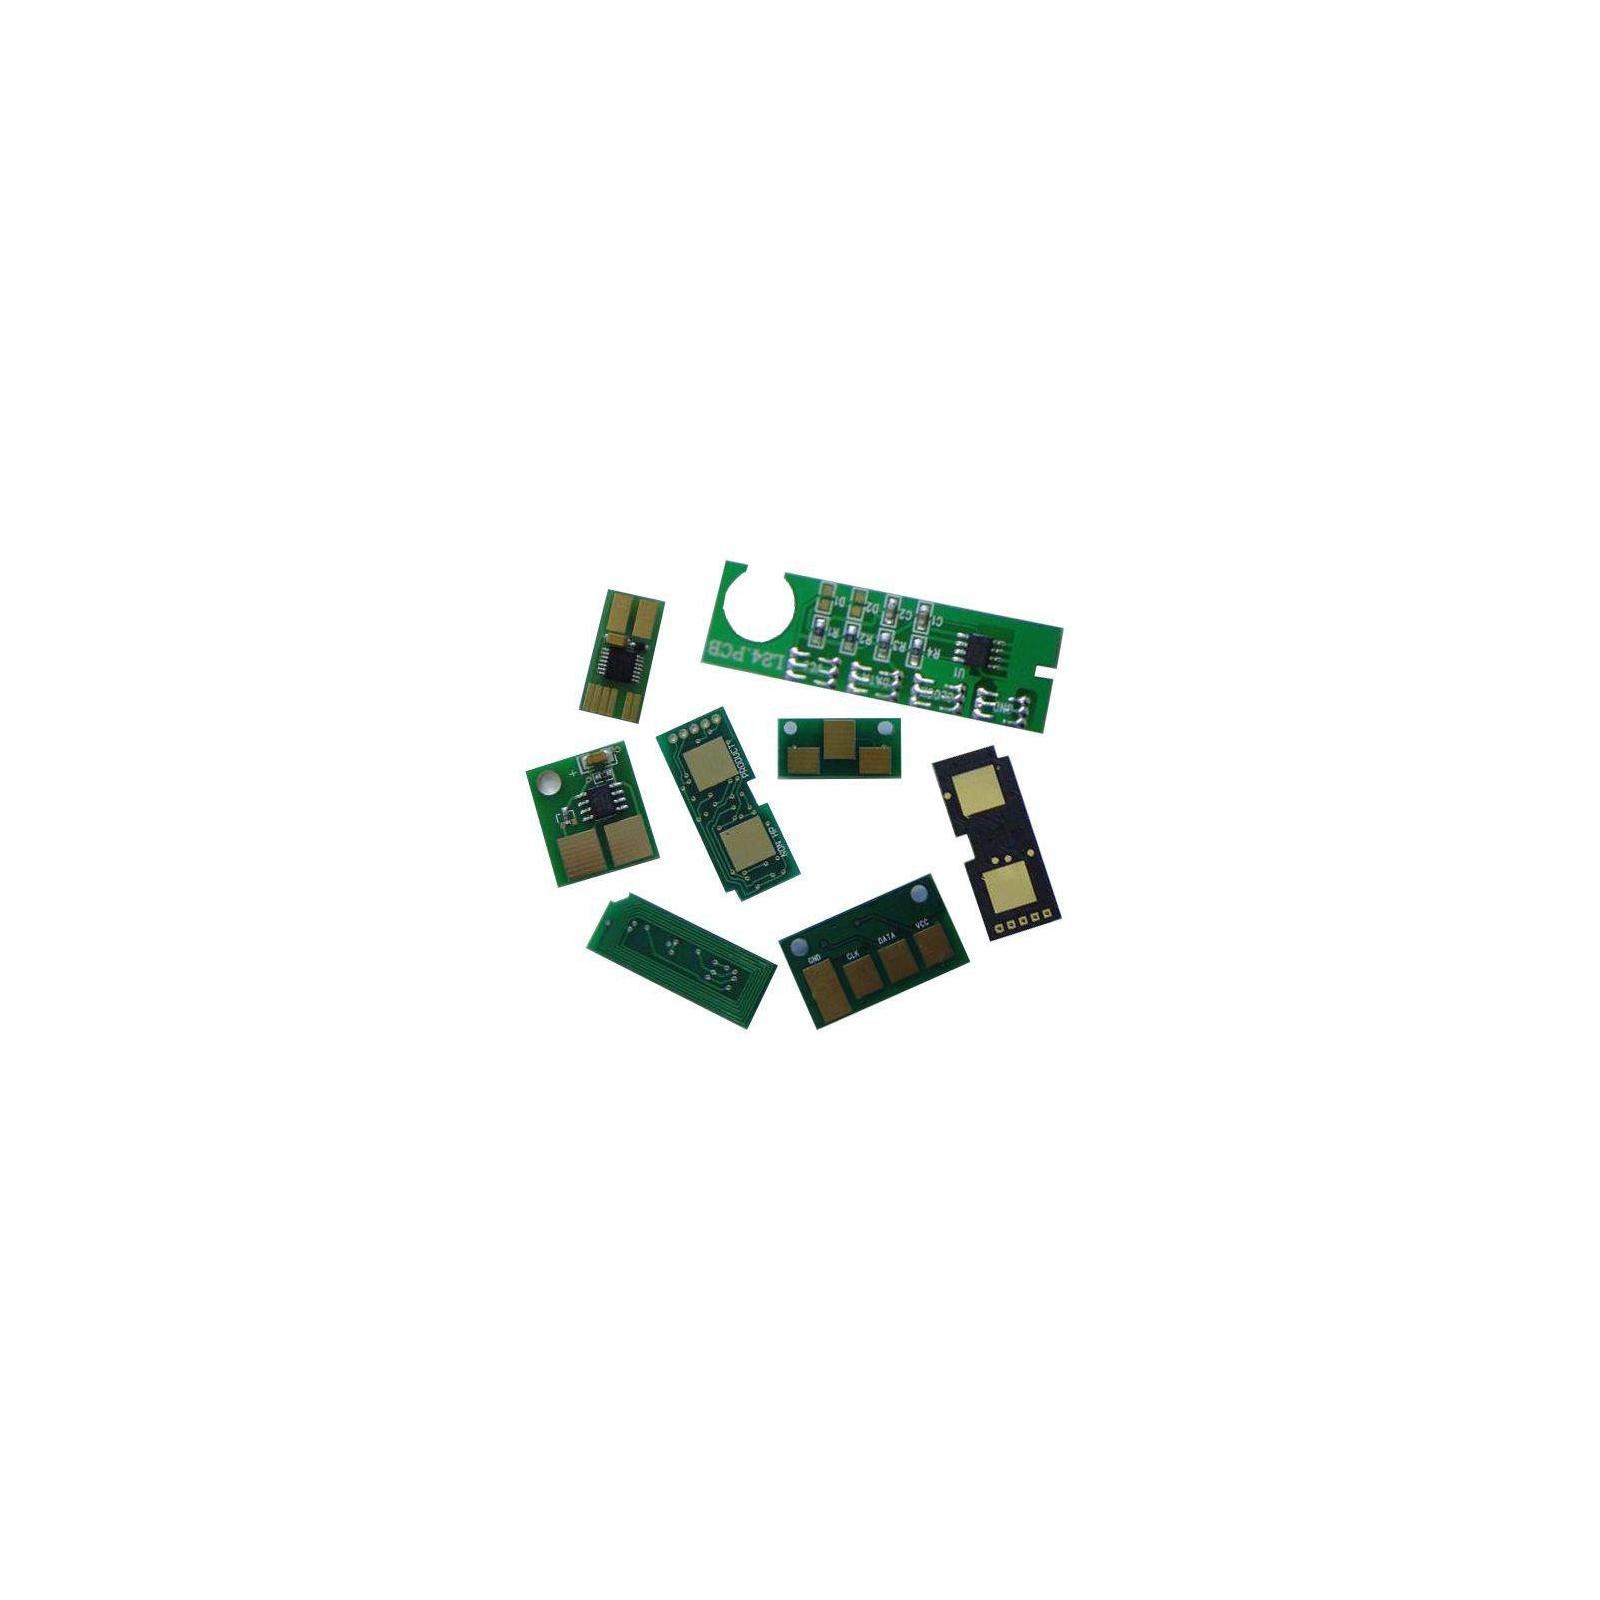 Чип для картриджа EPSON T3363 33XL ДЛЯ XP-530 MAGENTA Apex (CHIP-EPS-T3363-M)